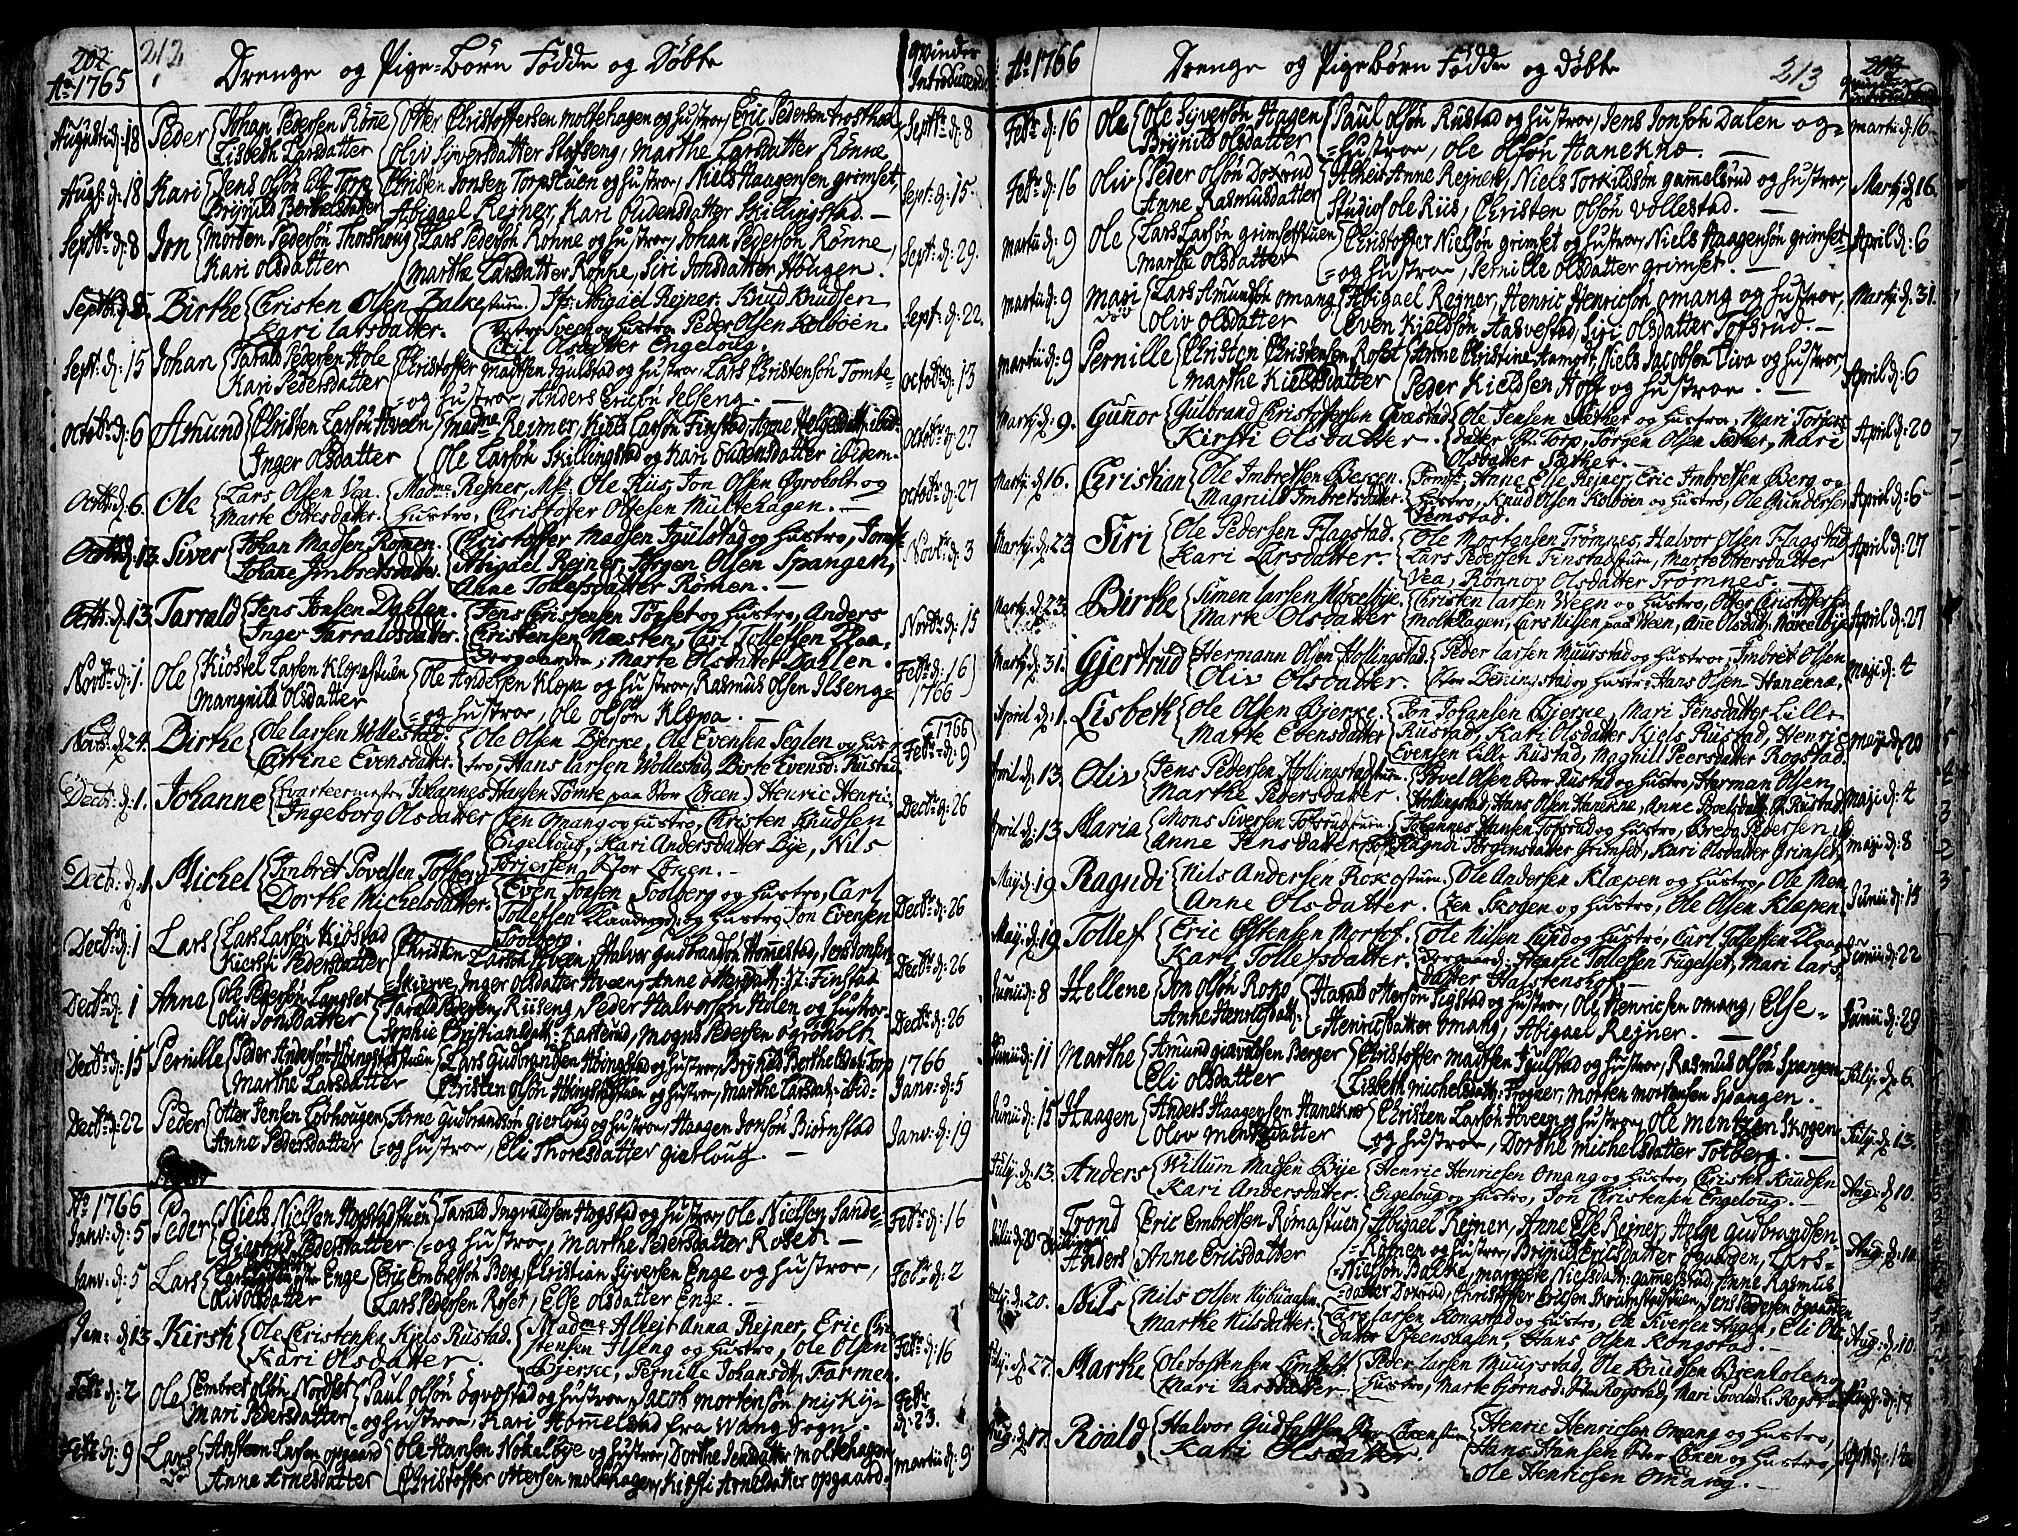 SAH, Løten prestekontor, K/Ka/L0002: Ministerialbok nr. 2, 1731-1772, s. 212-213